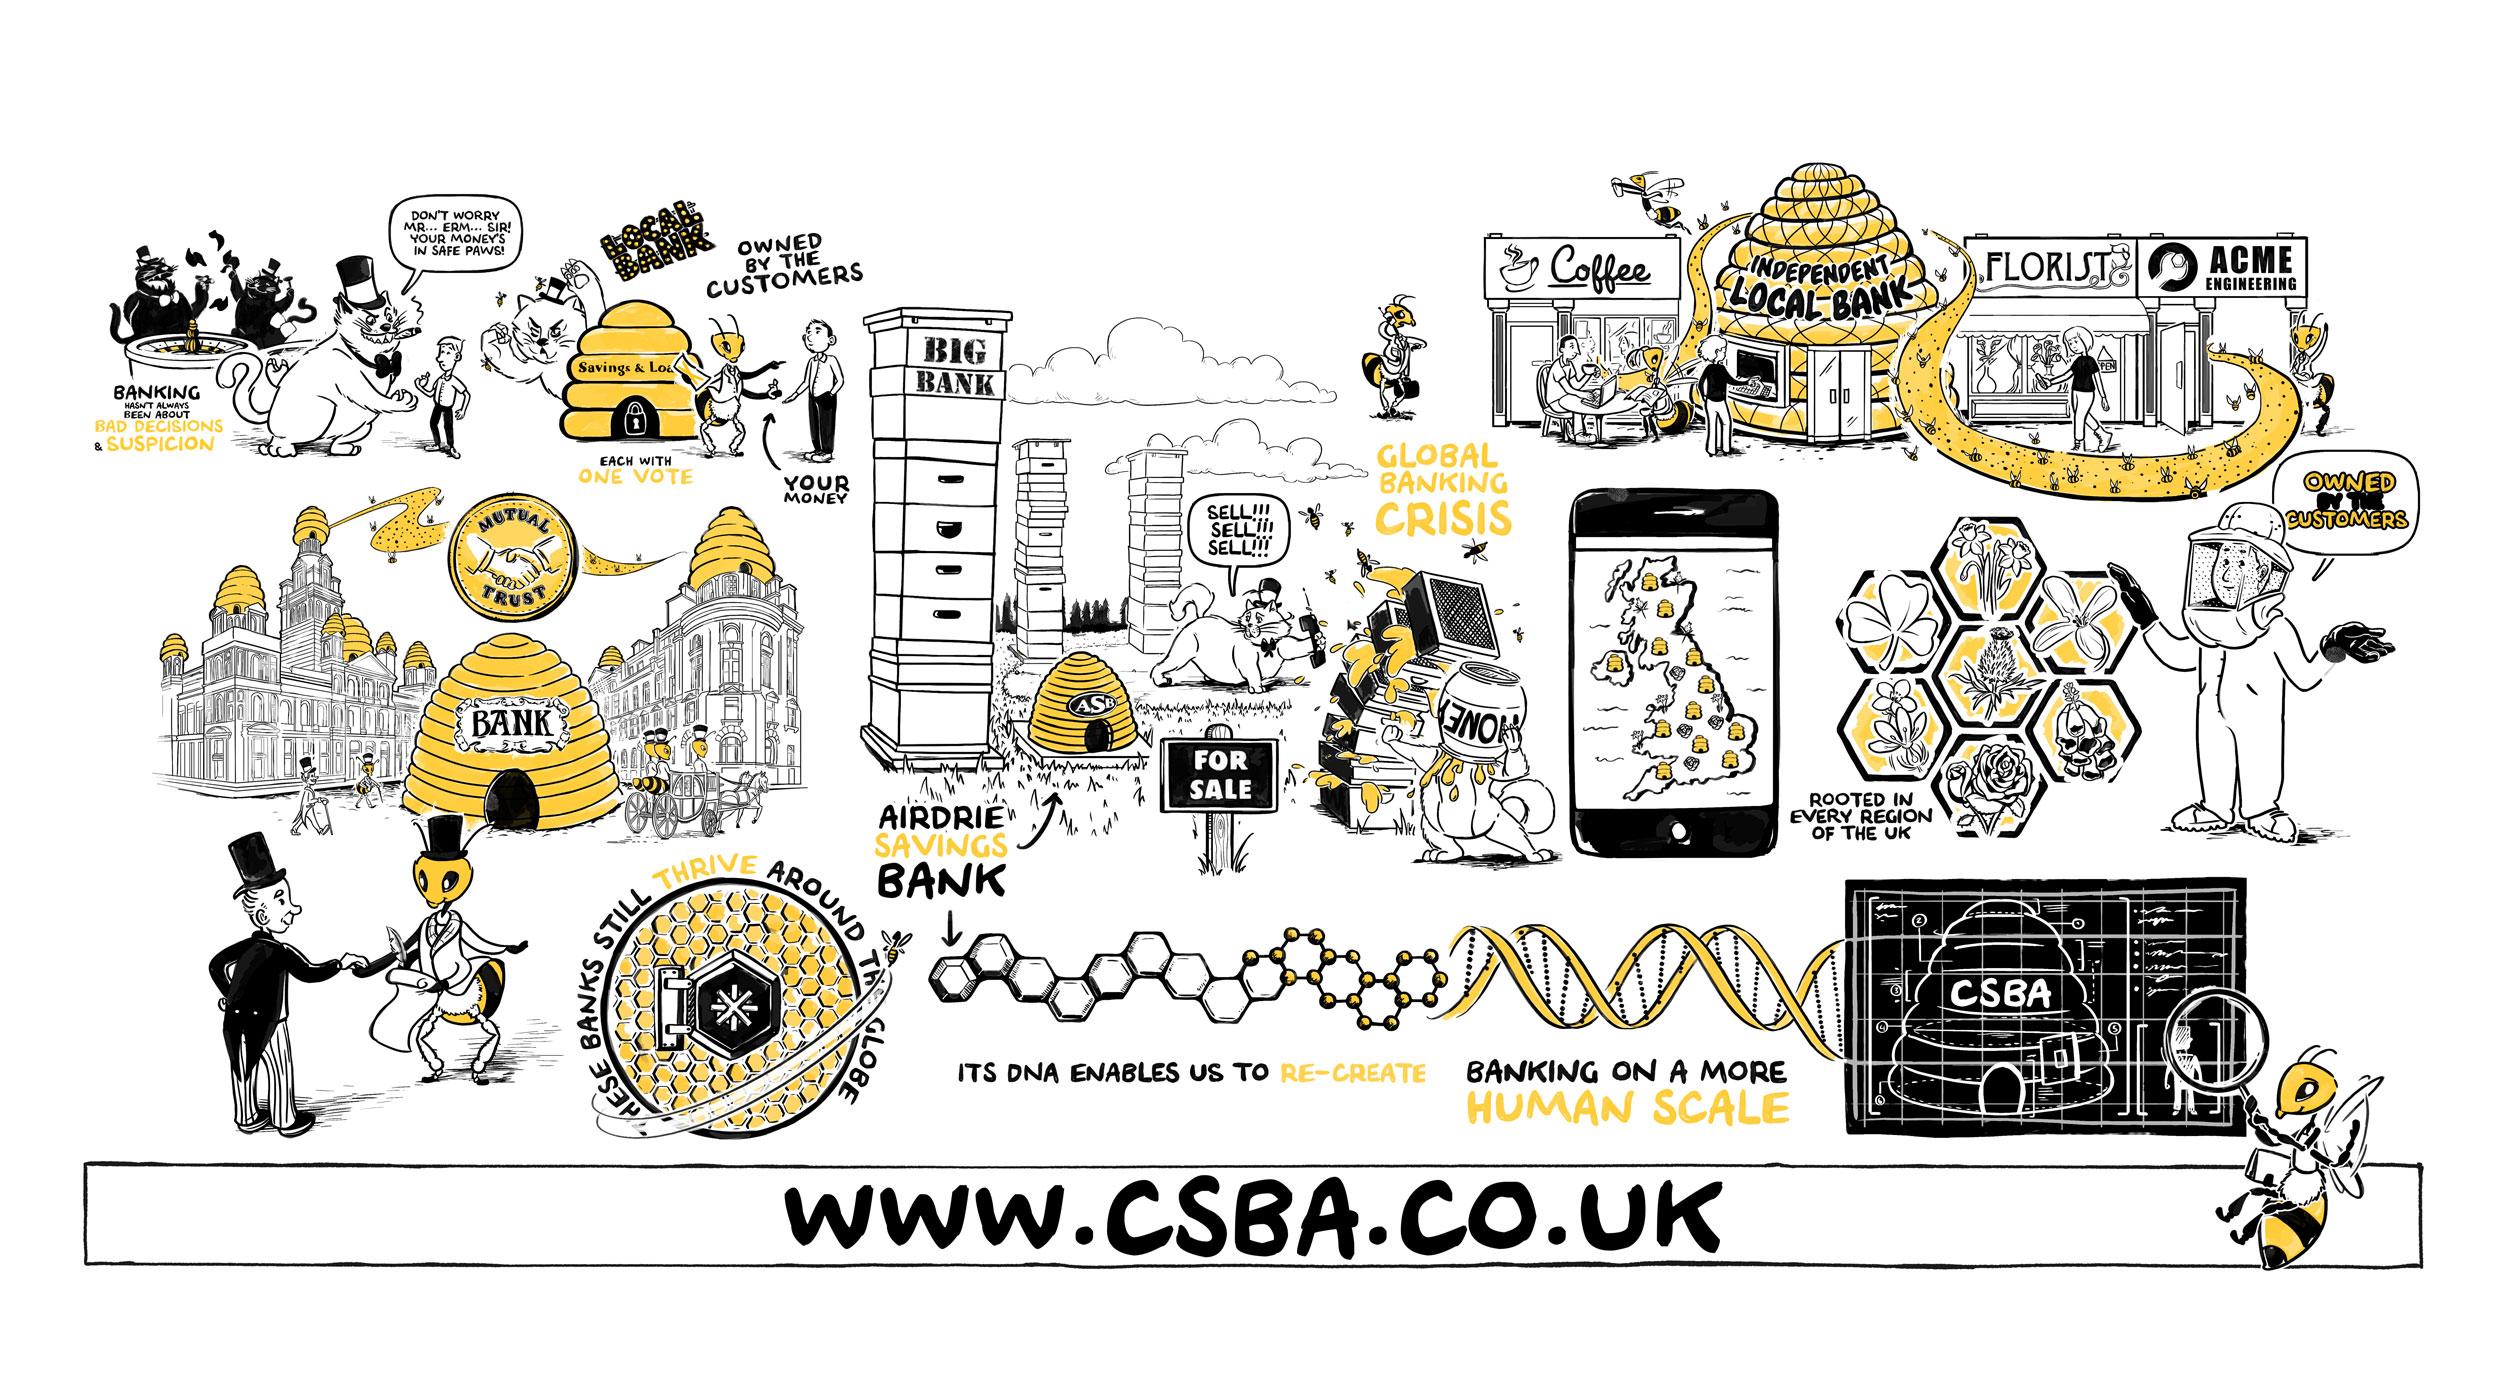 CBSA_Scrapbook_08.jpg